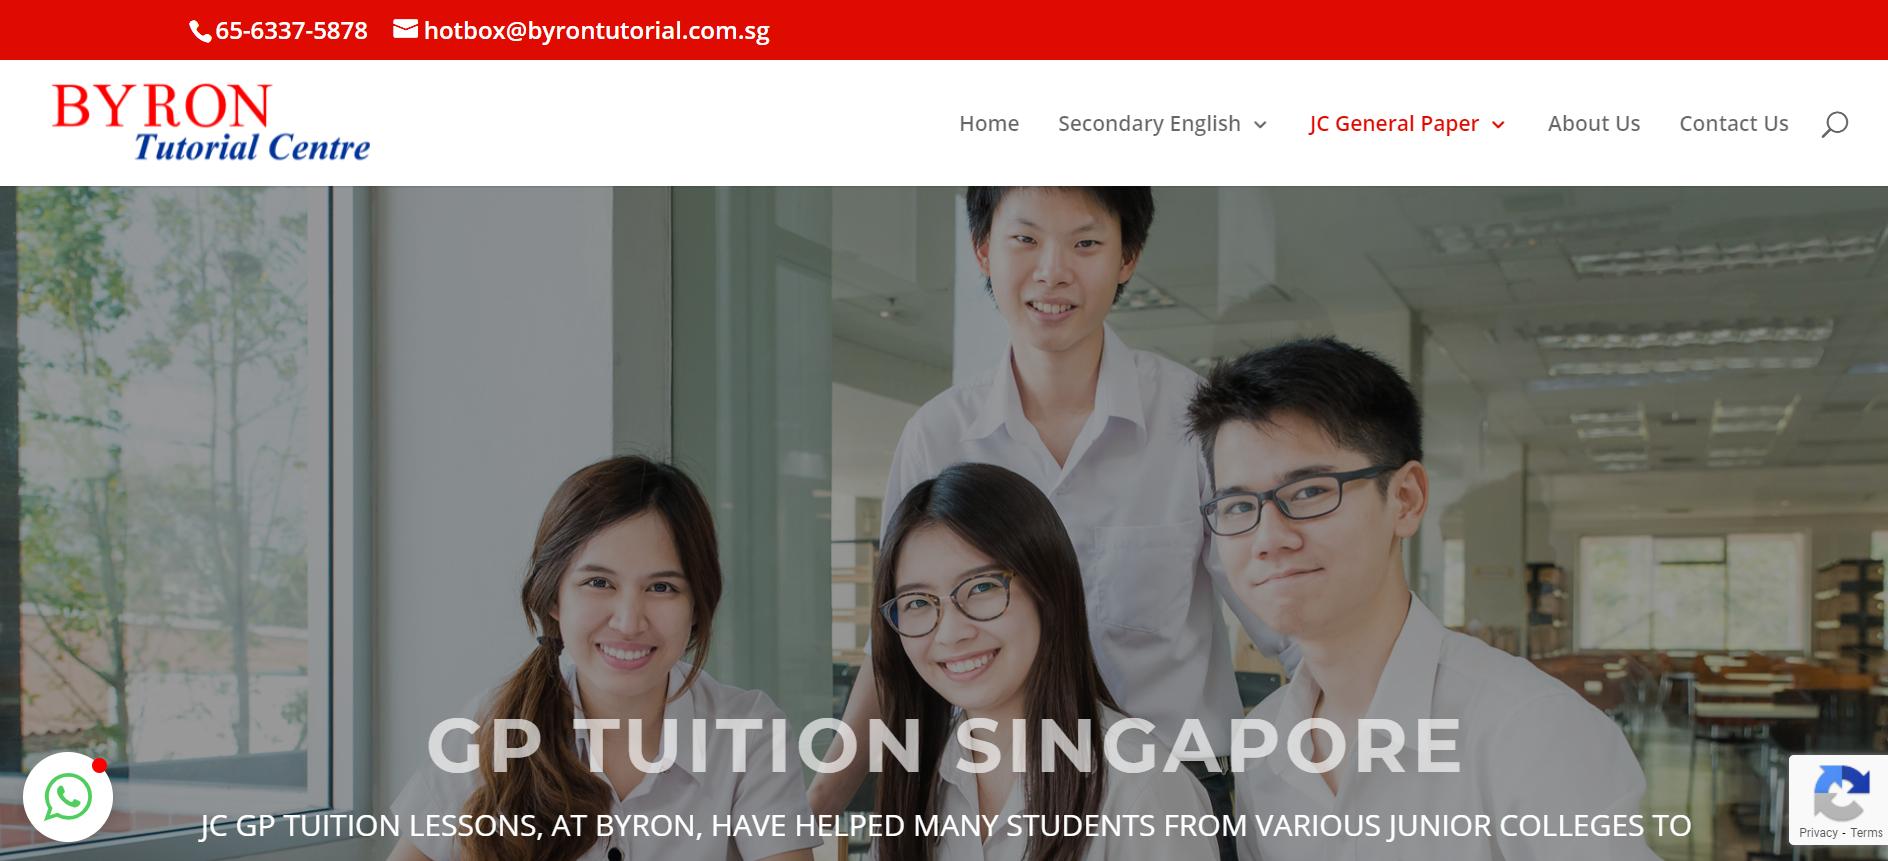 Byron Tutorial Centre GP Tuition